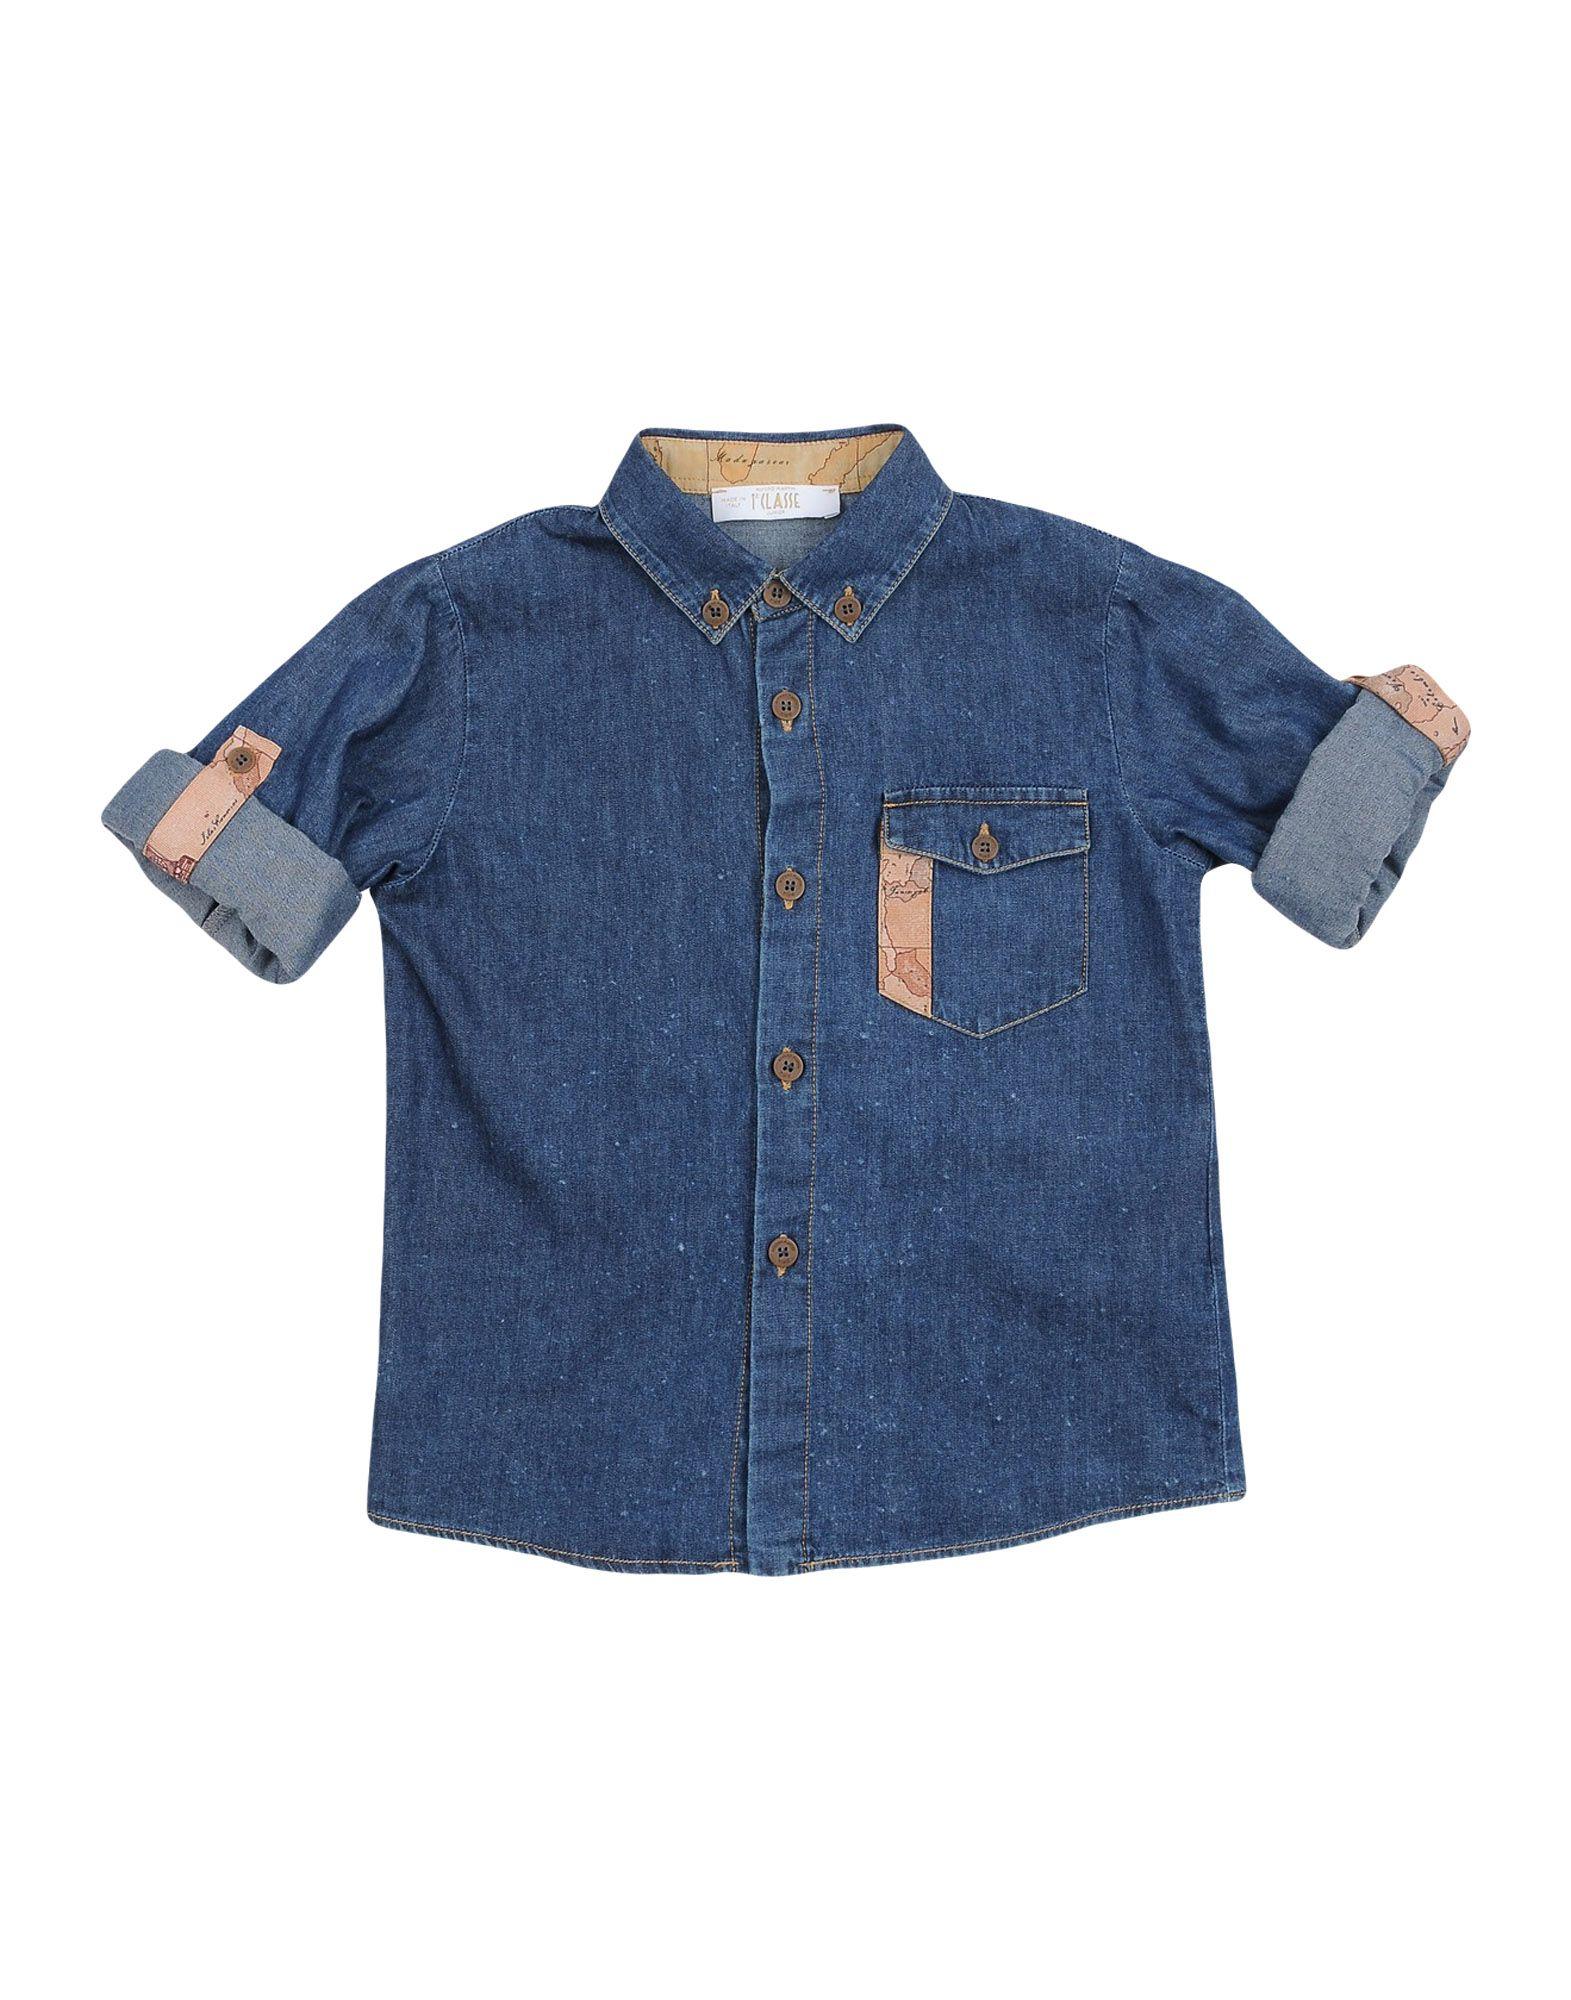 ALVIERO MARTINI 1a CLASSE Denim shirts